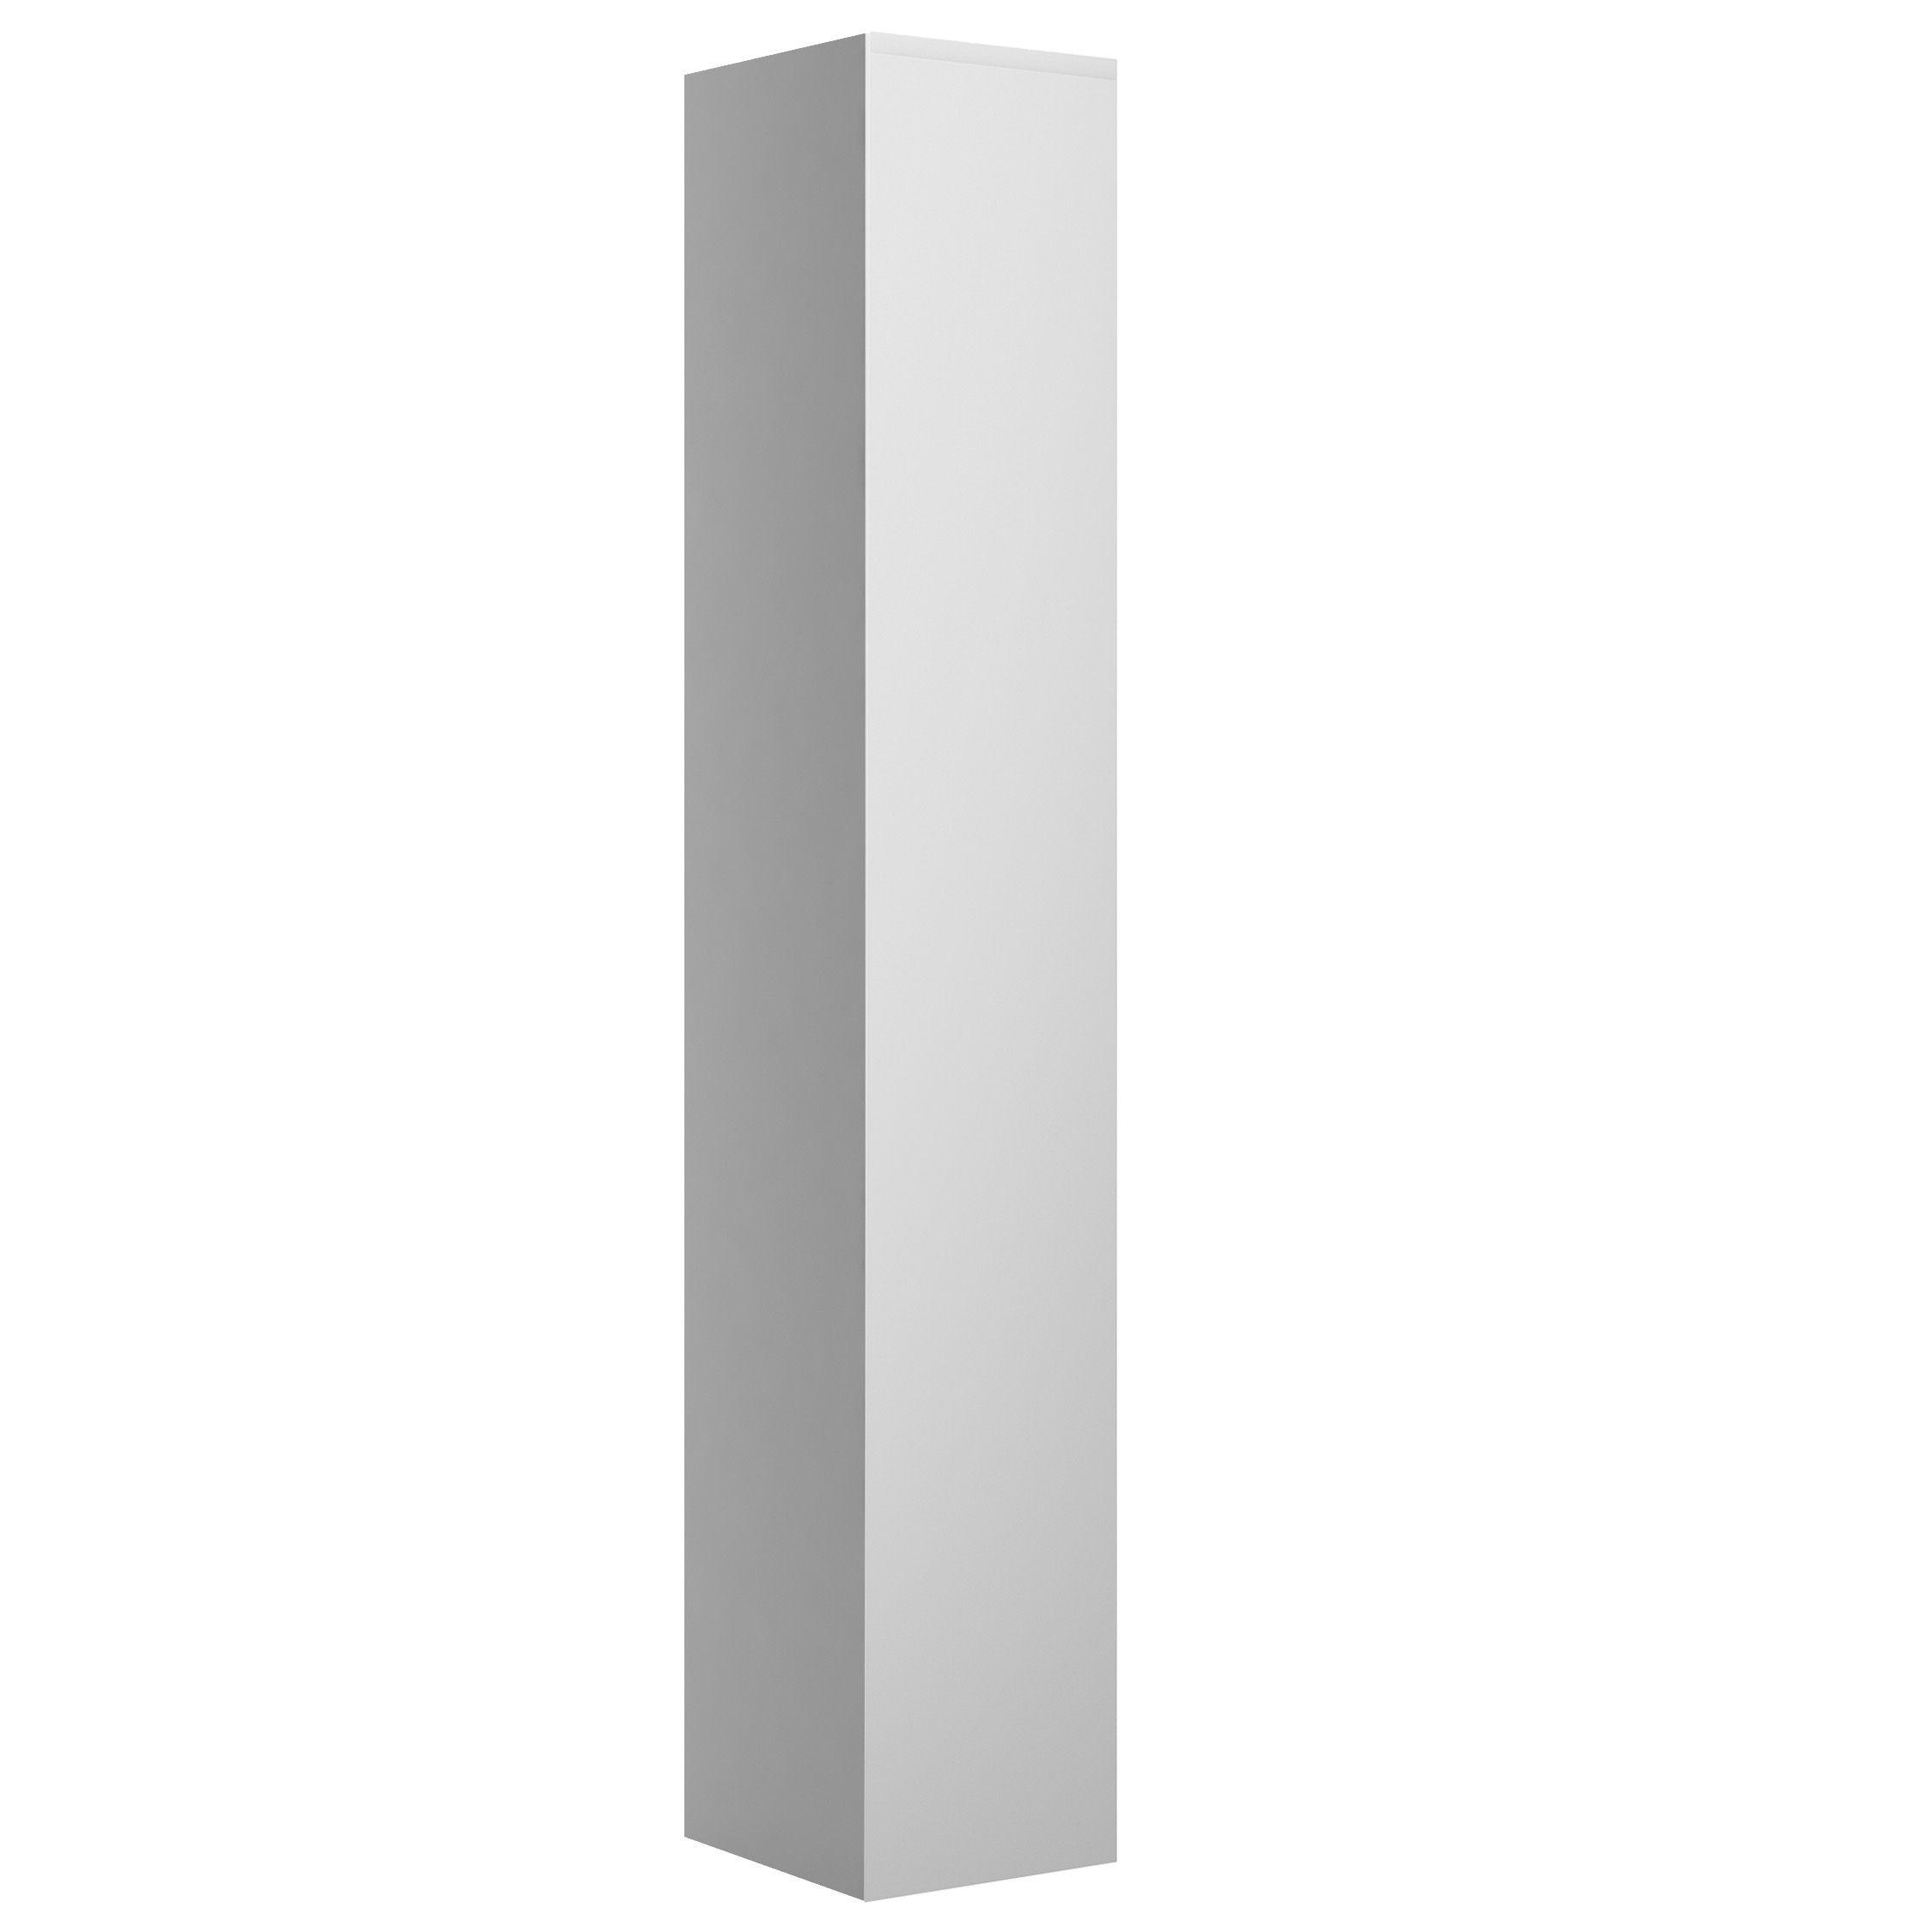 Cooke & Lewis Marletti Gloss Stone 1 Door Tall Unit, (w)300mm